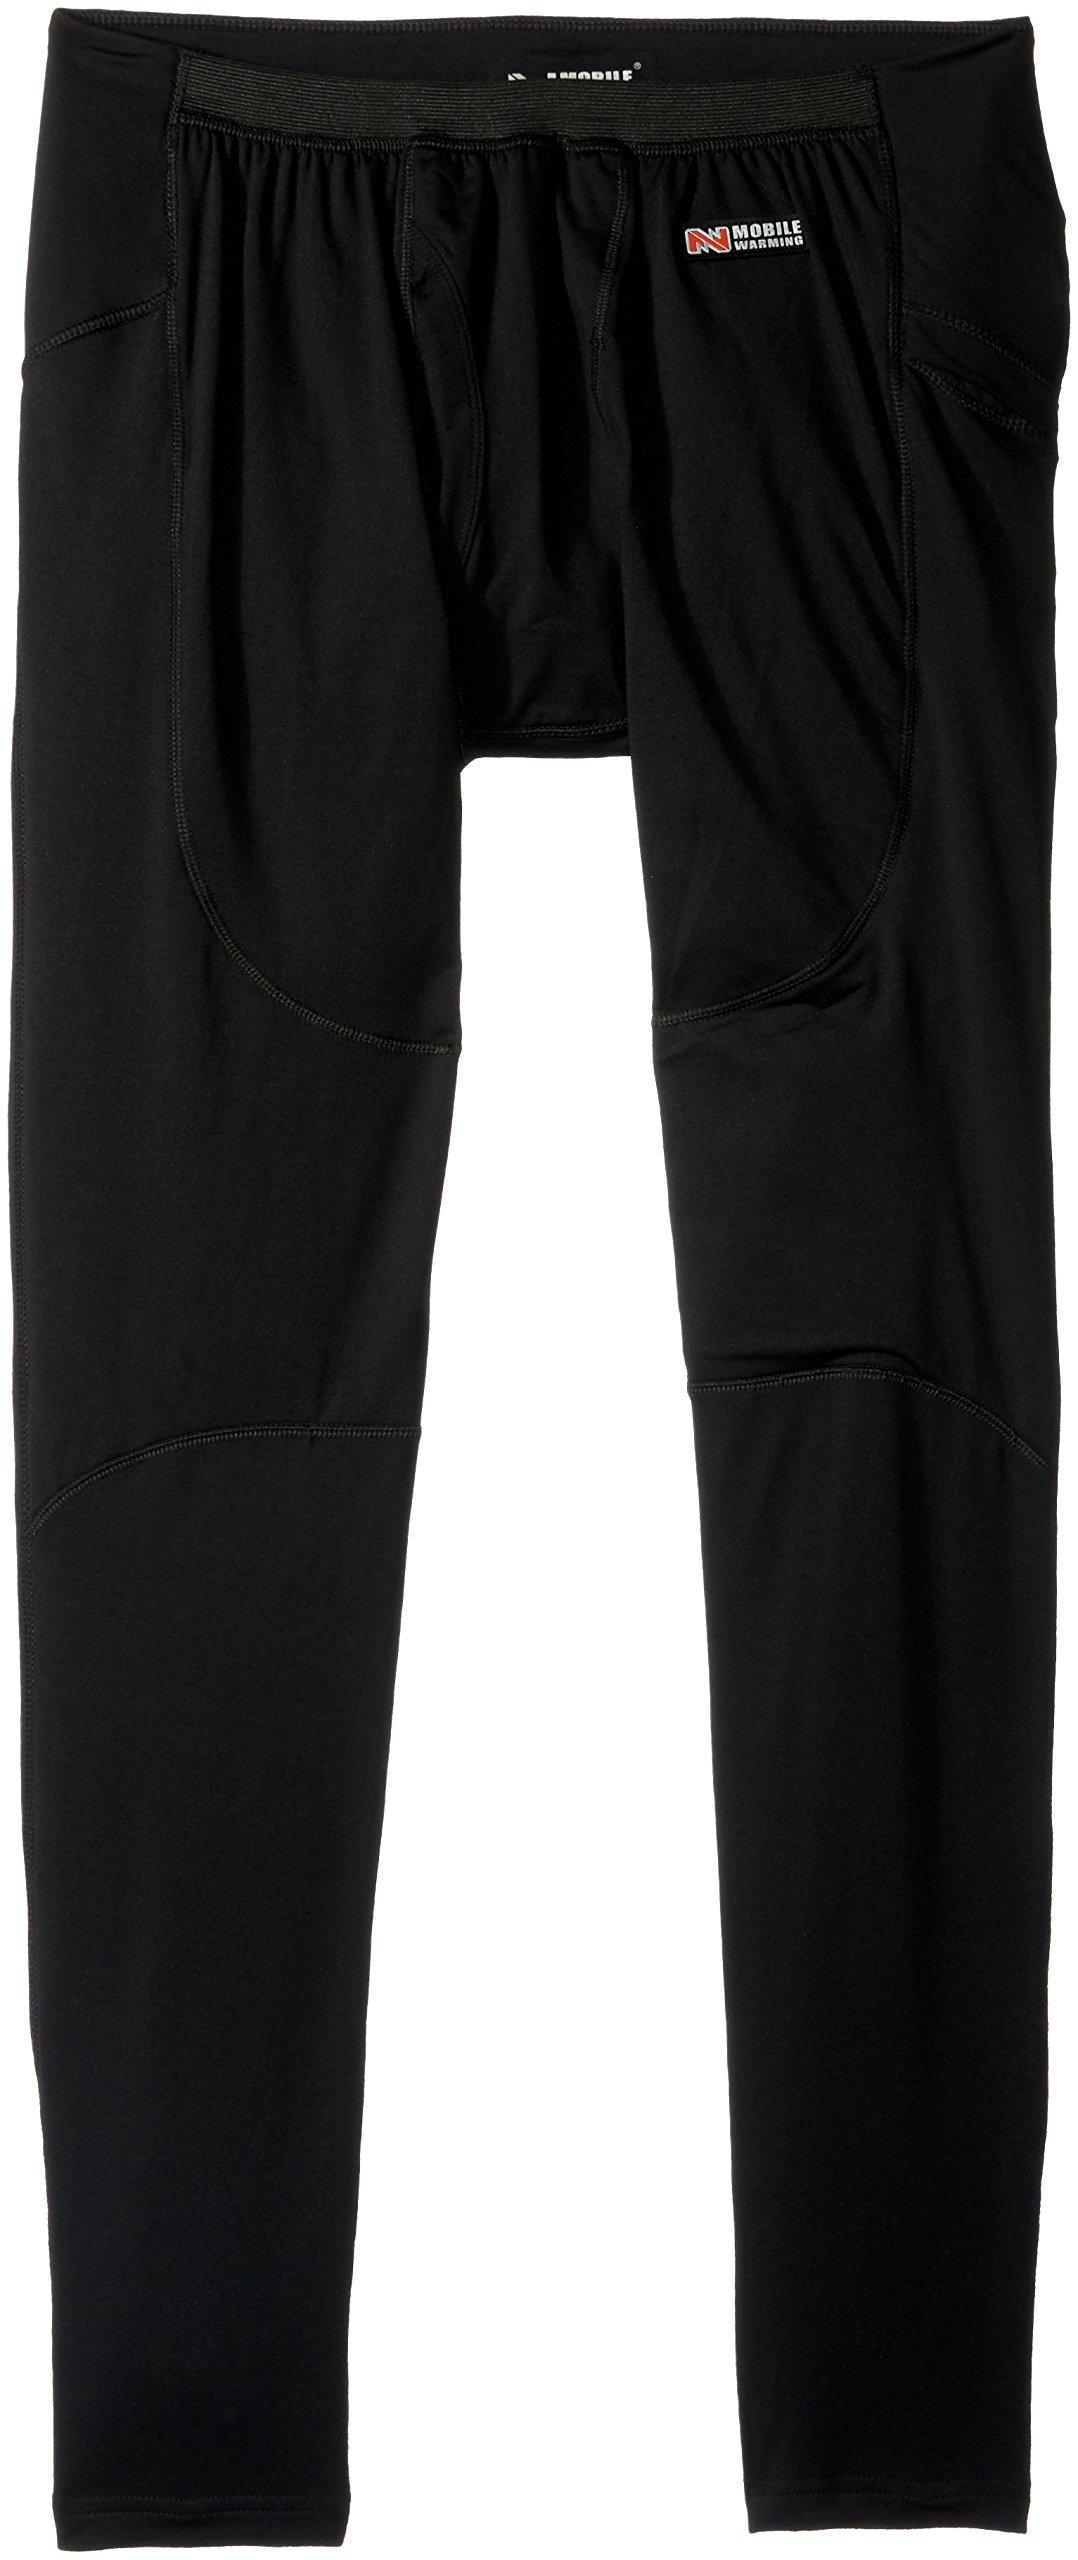 MOBILE WARMING Longment Heated Base Layer Pant (Large, Black)